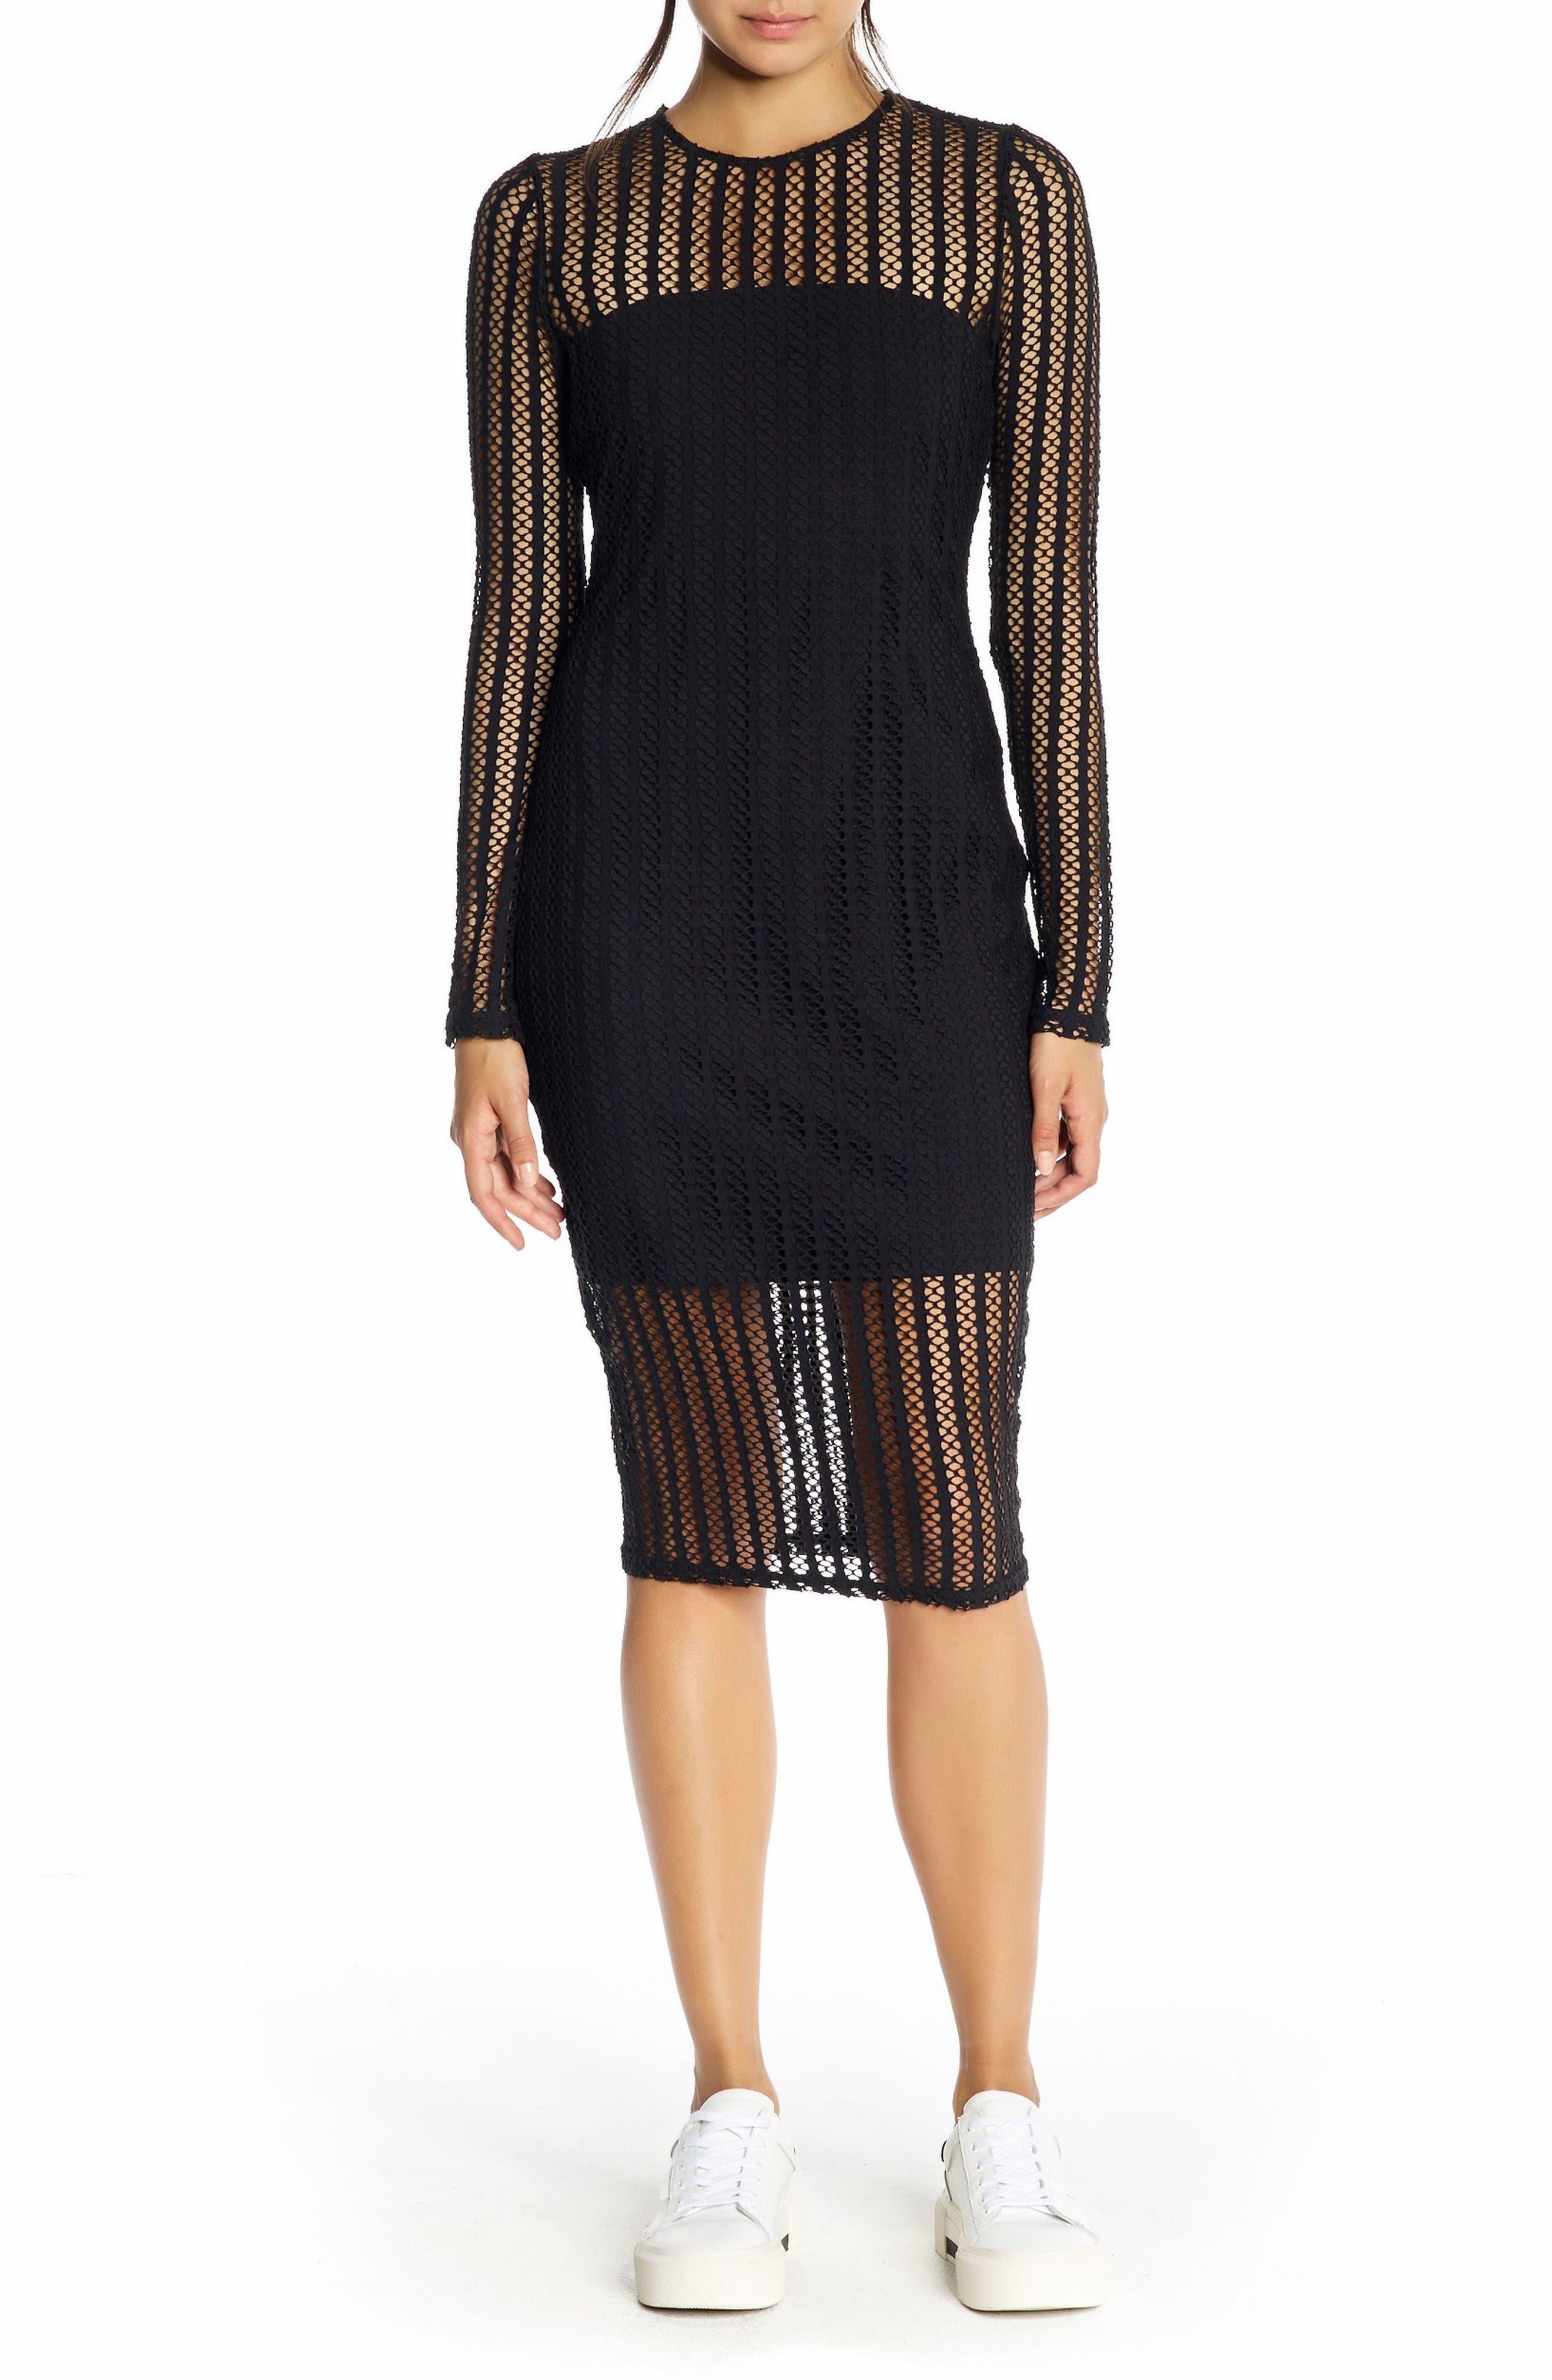 Alternate Image 1 Selected - KENDALL + KYLIE Lattice Jersey Dress